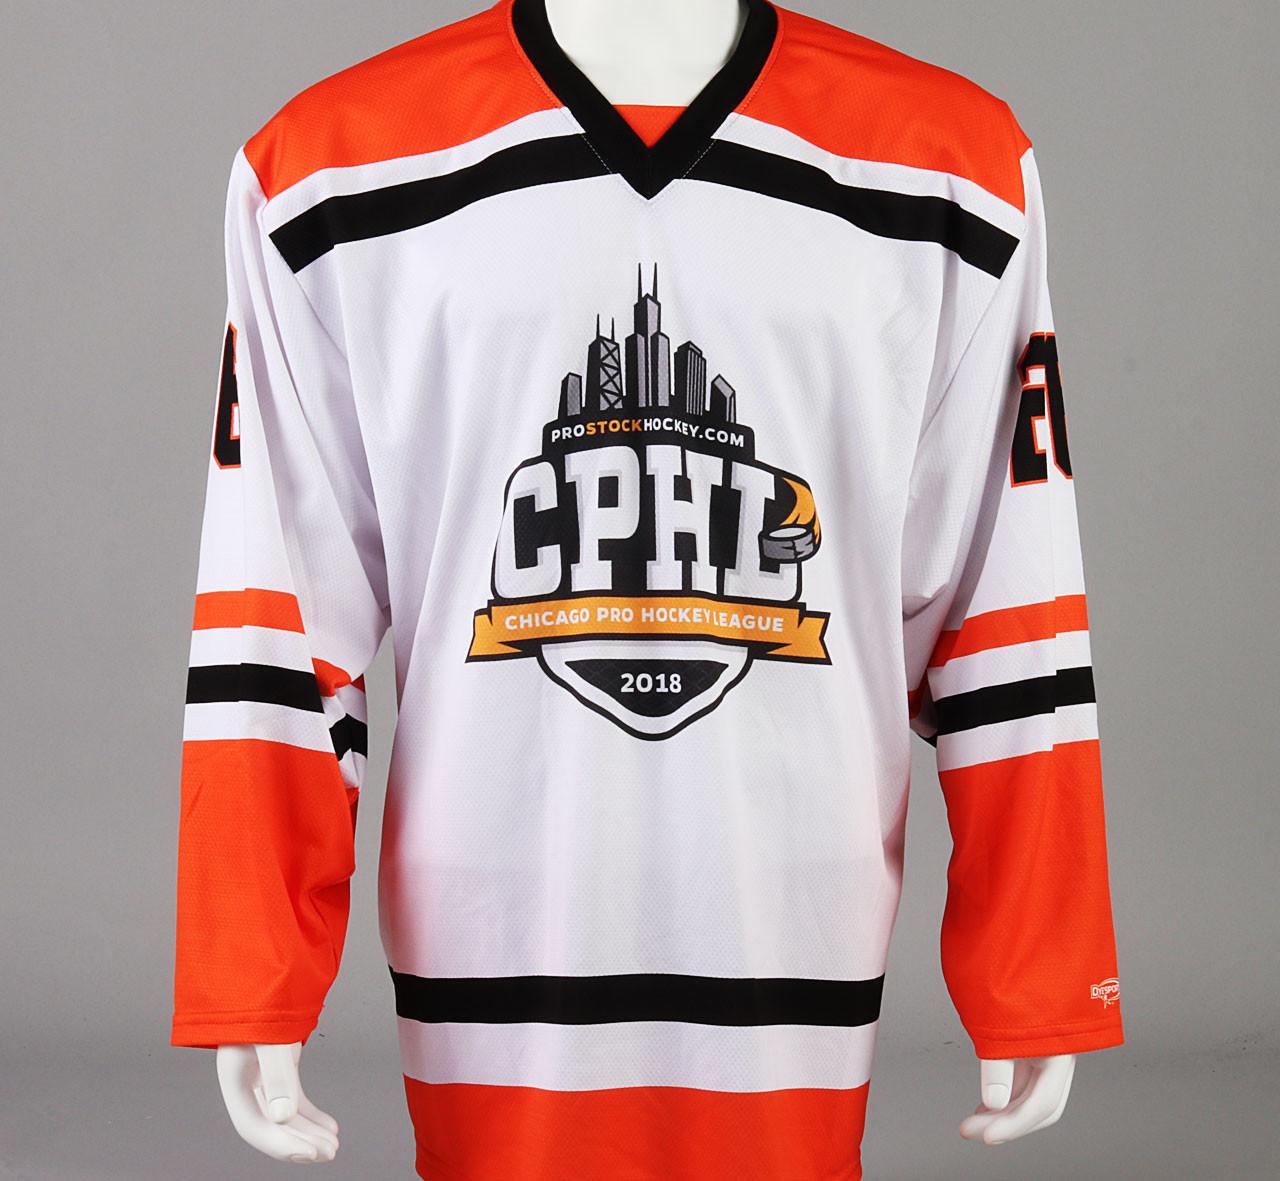 Large Orange Chicago Pro Hockey League Jersey - Nathan Clurman - Pro ... 74d006fb584